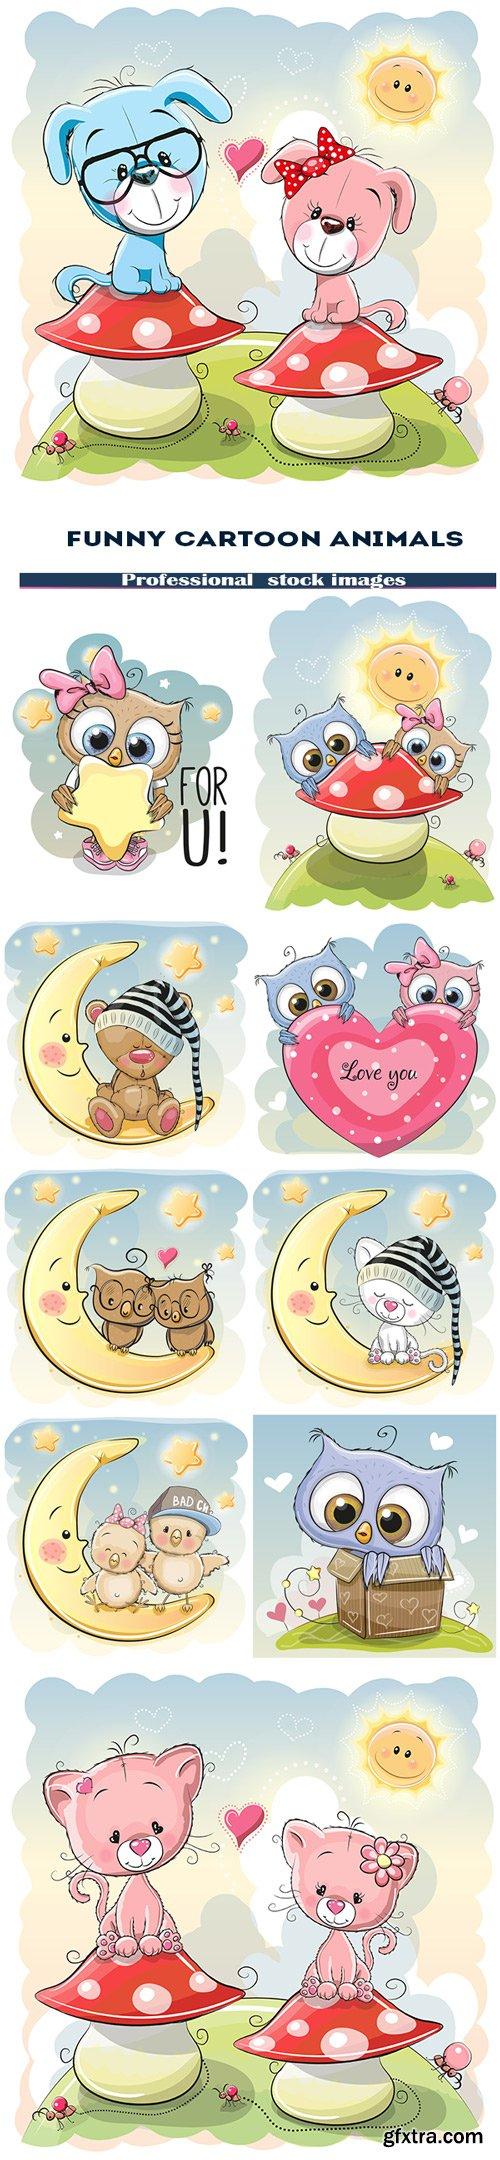 Funny cartoon animals